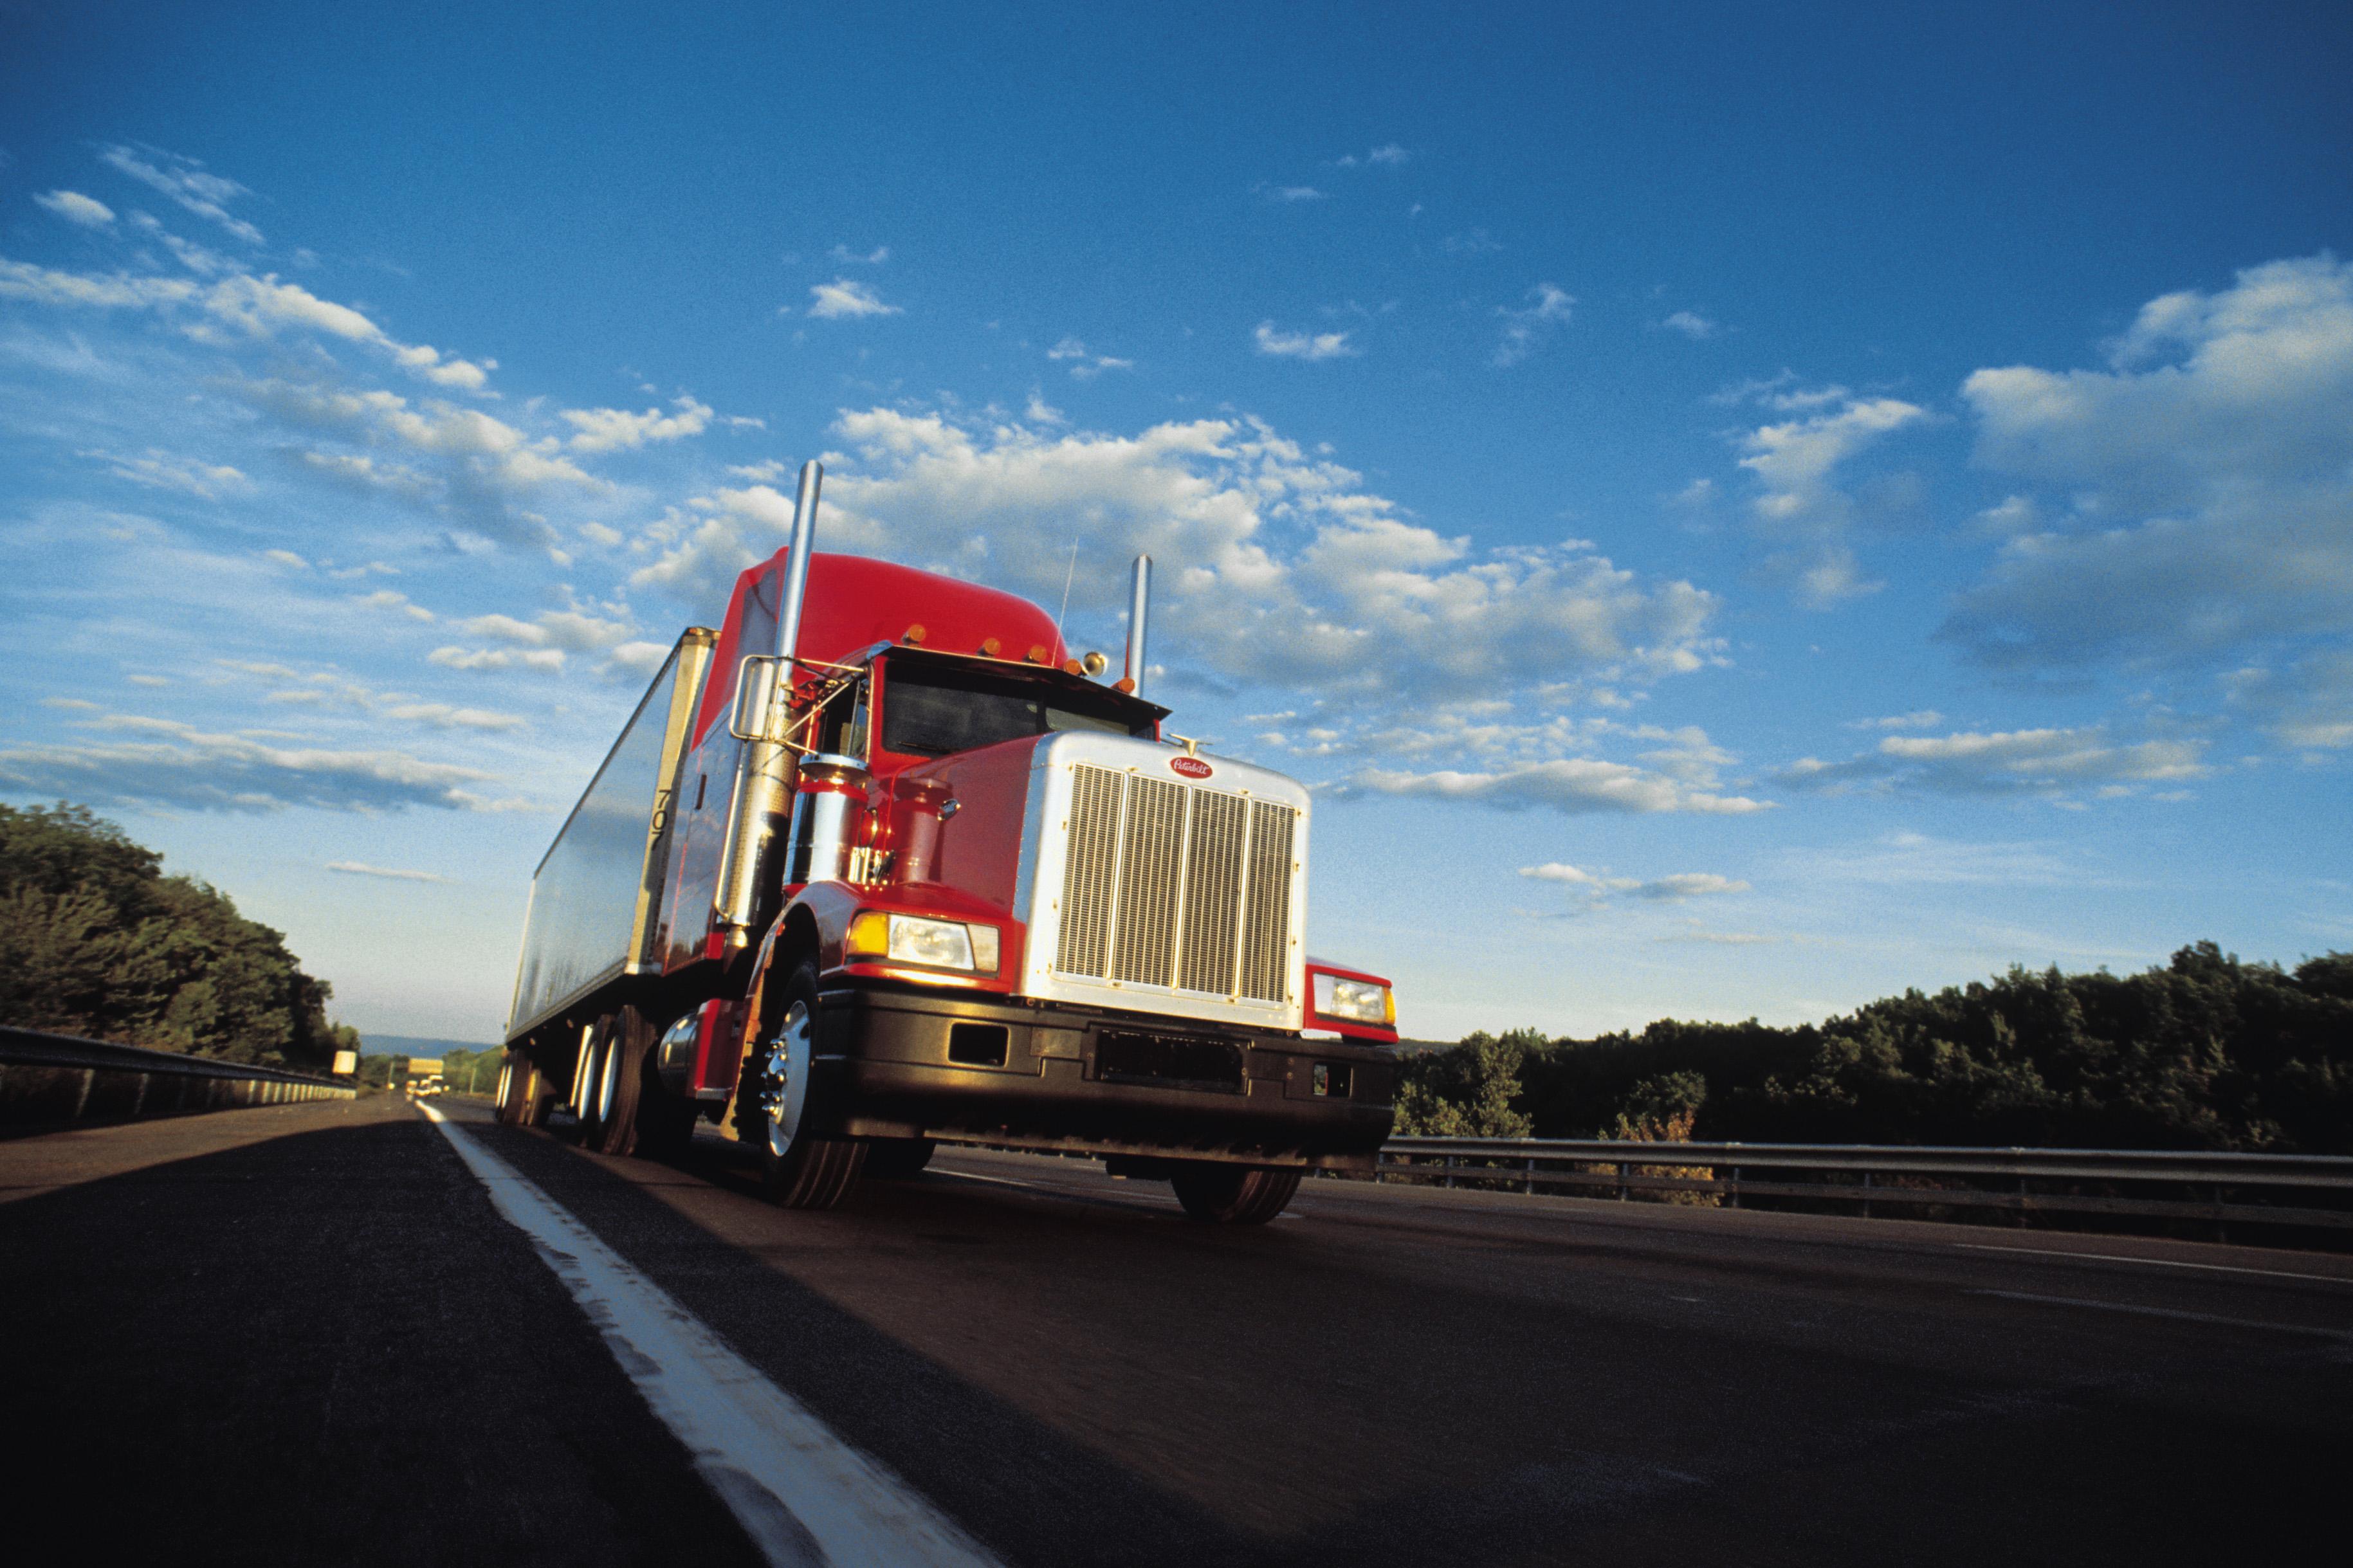 Providing preventative maintenance and repair services for fleet, semi-trucks and diesel equipment.